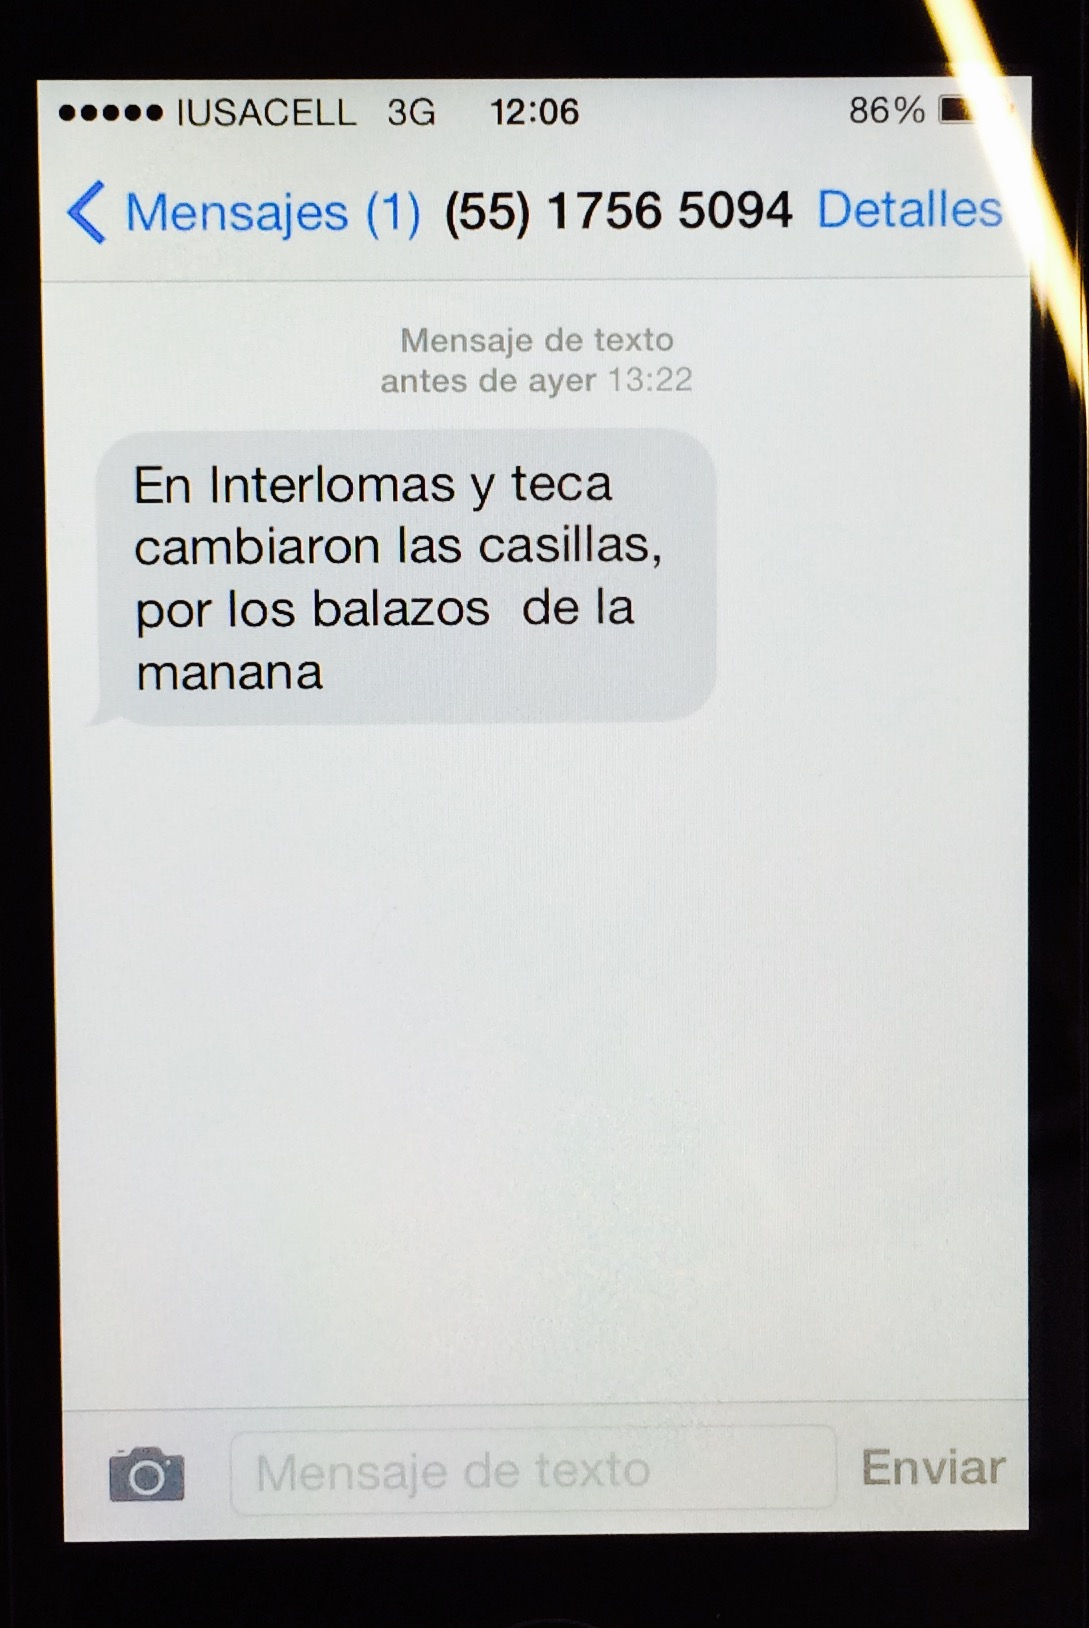 Mensaje SMS 3